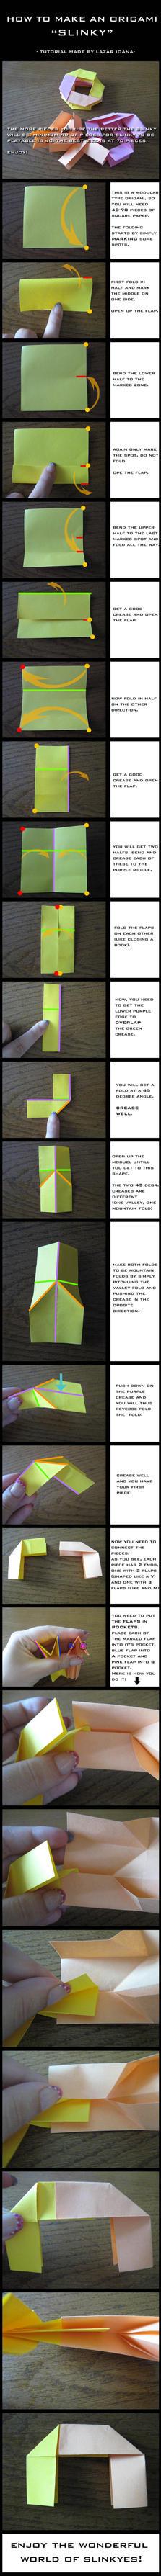 Tutorial: How to make an Origami Slinky by DarkUmah